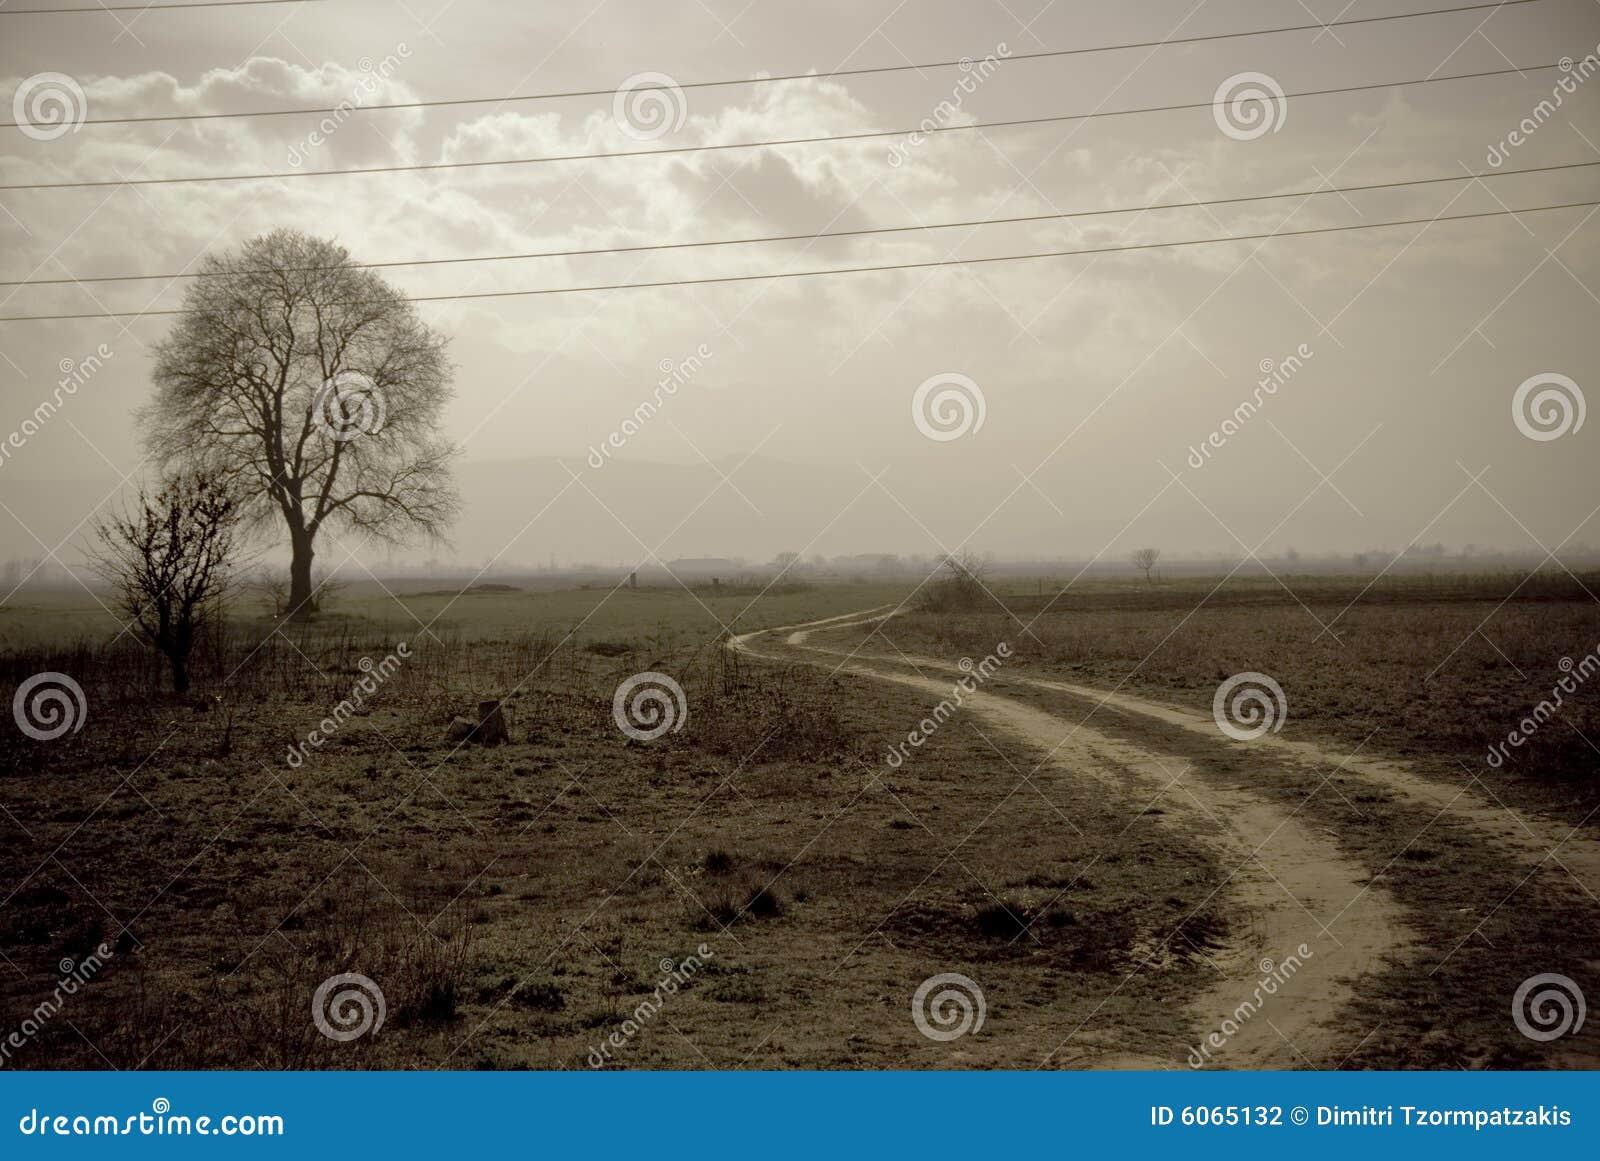 Vintage Photo Landscape Stock Photography - Image: 6065132